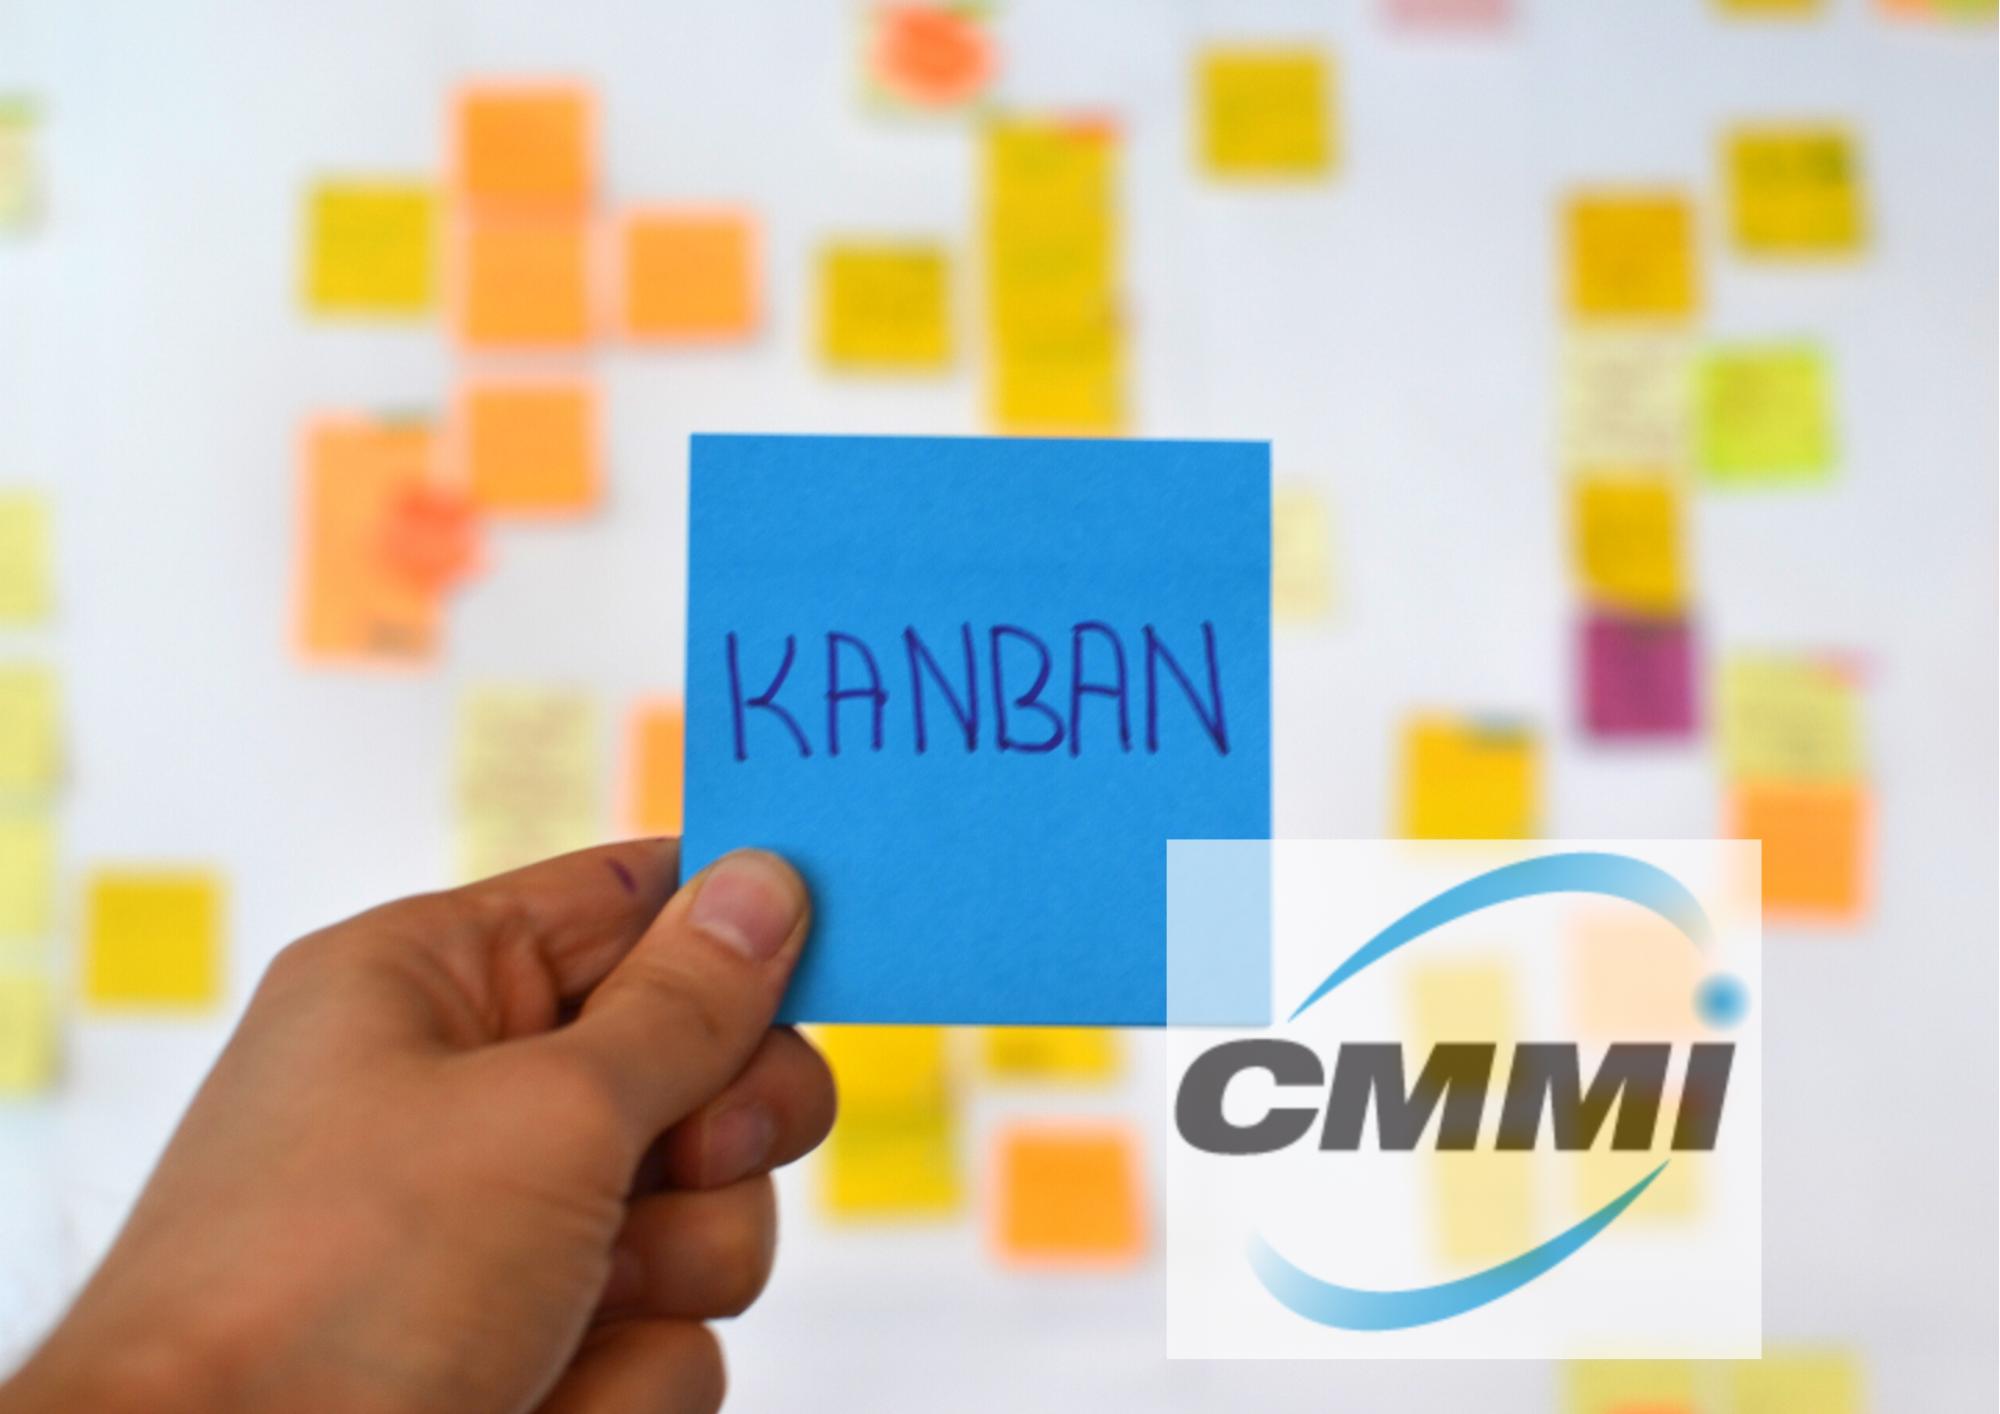 Imagen Kanban y CMMI